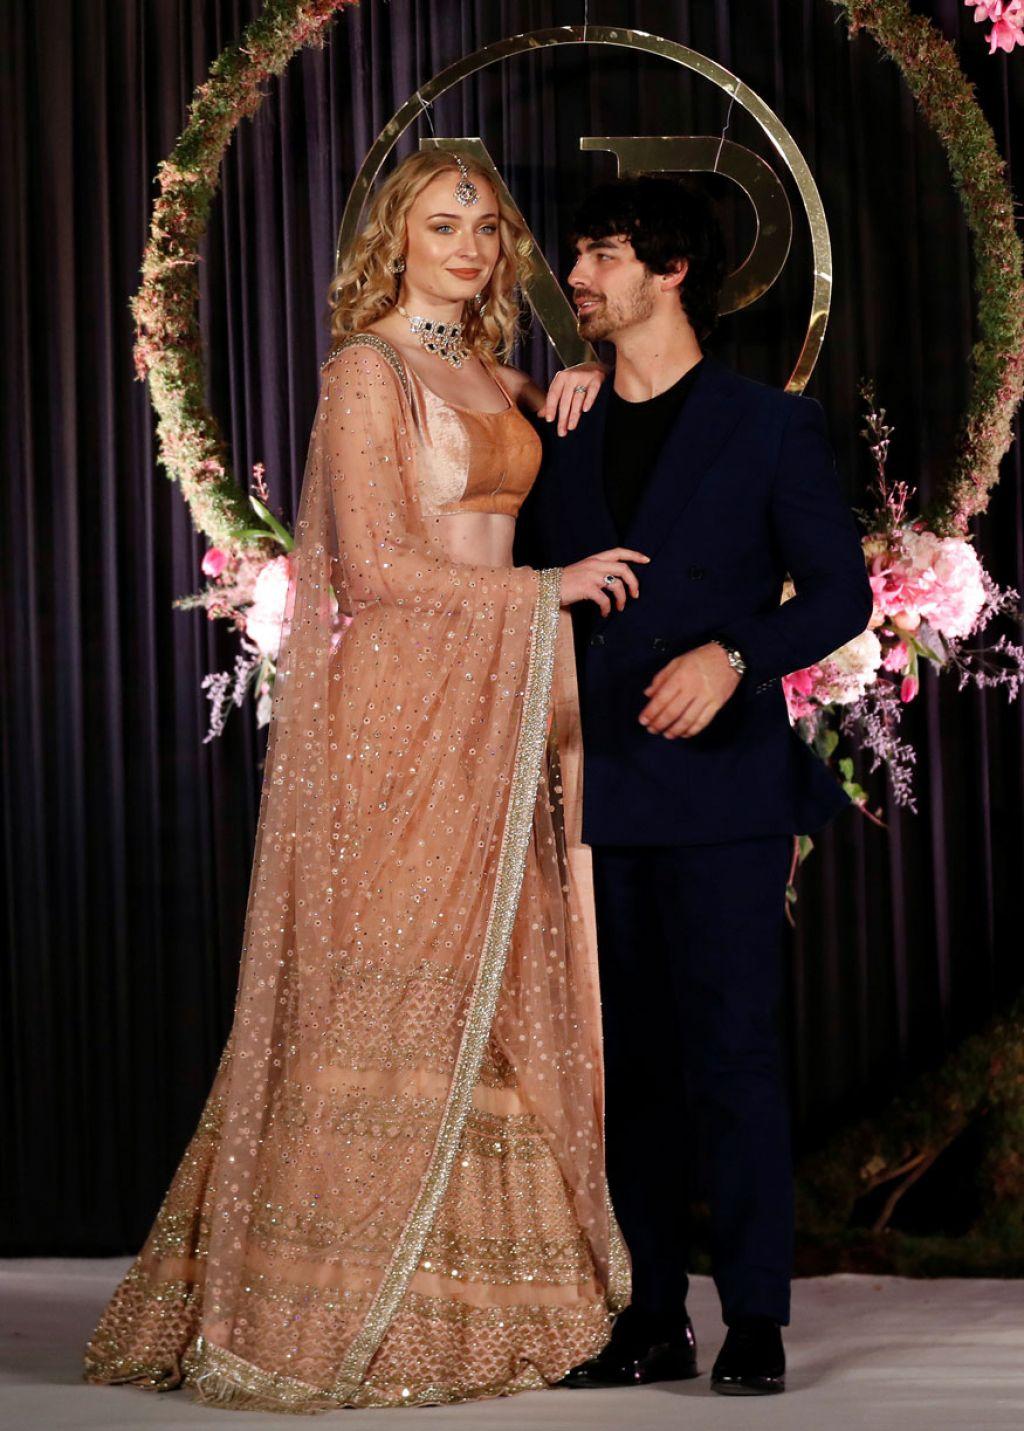 Celebrity wedding photos 2019